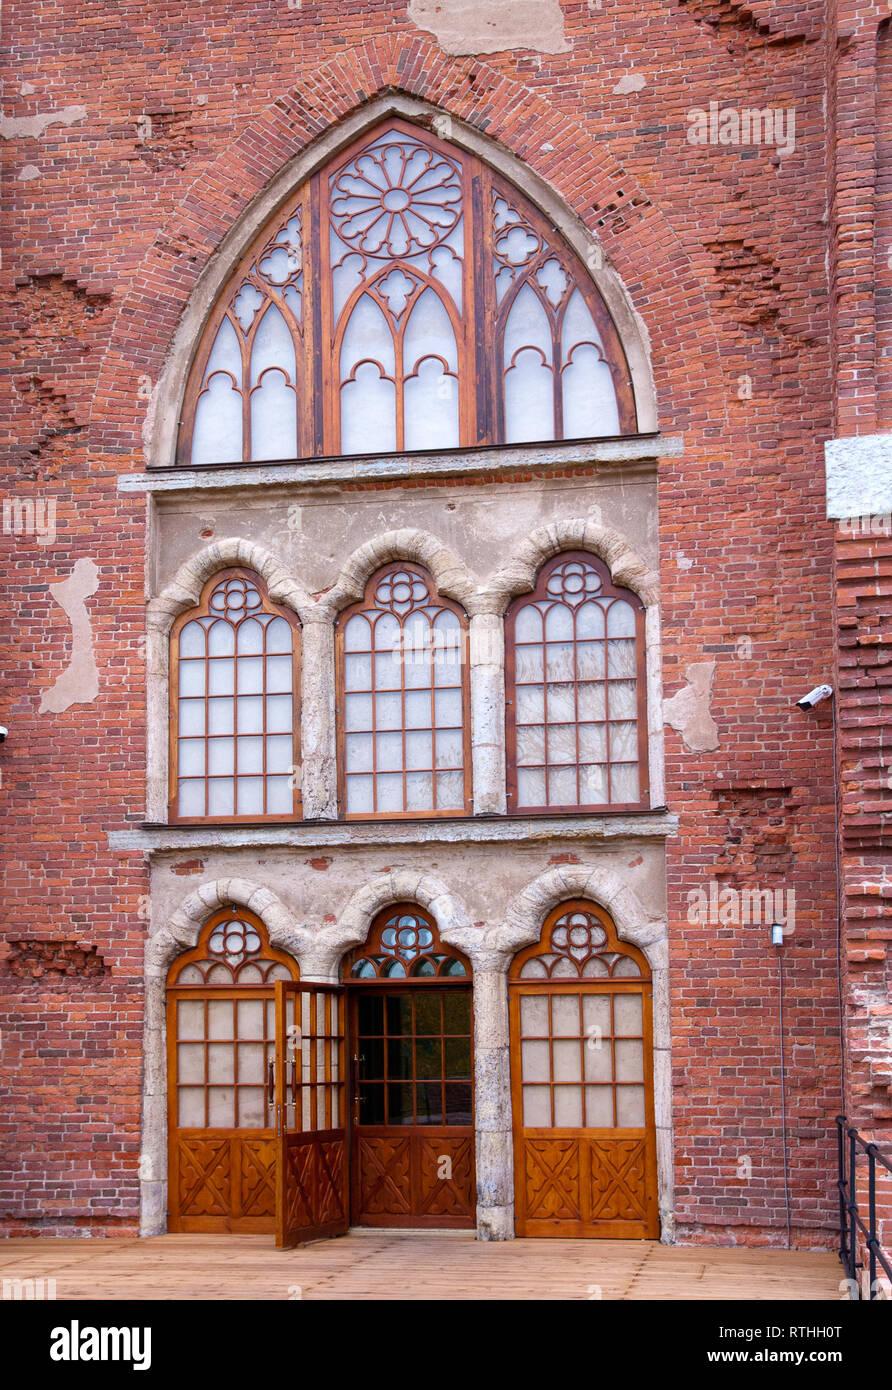 TSARSKOYE SELO, SAINT-PETERSBURG, RUSSIA – OCTOBER 8, 2018: Fragment of The Chapell Pavilion after restoration in Alexander Park - Stock Image